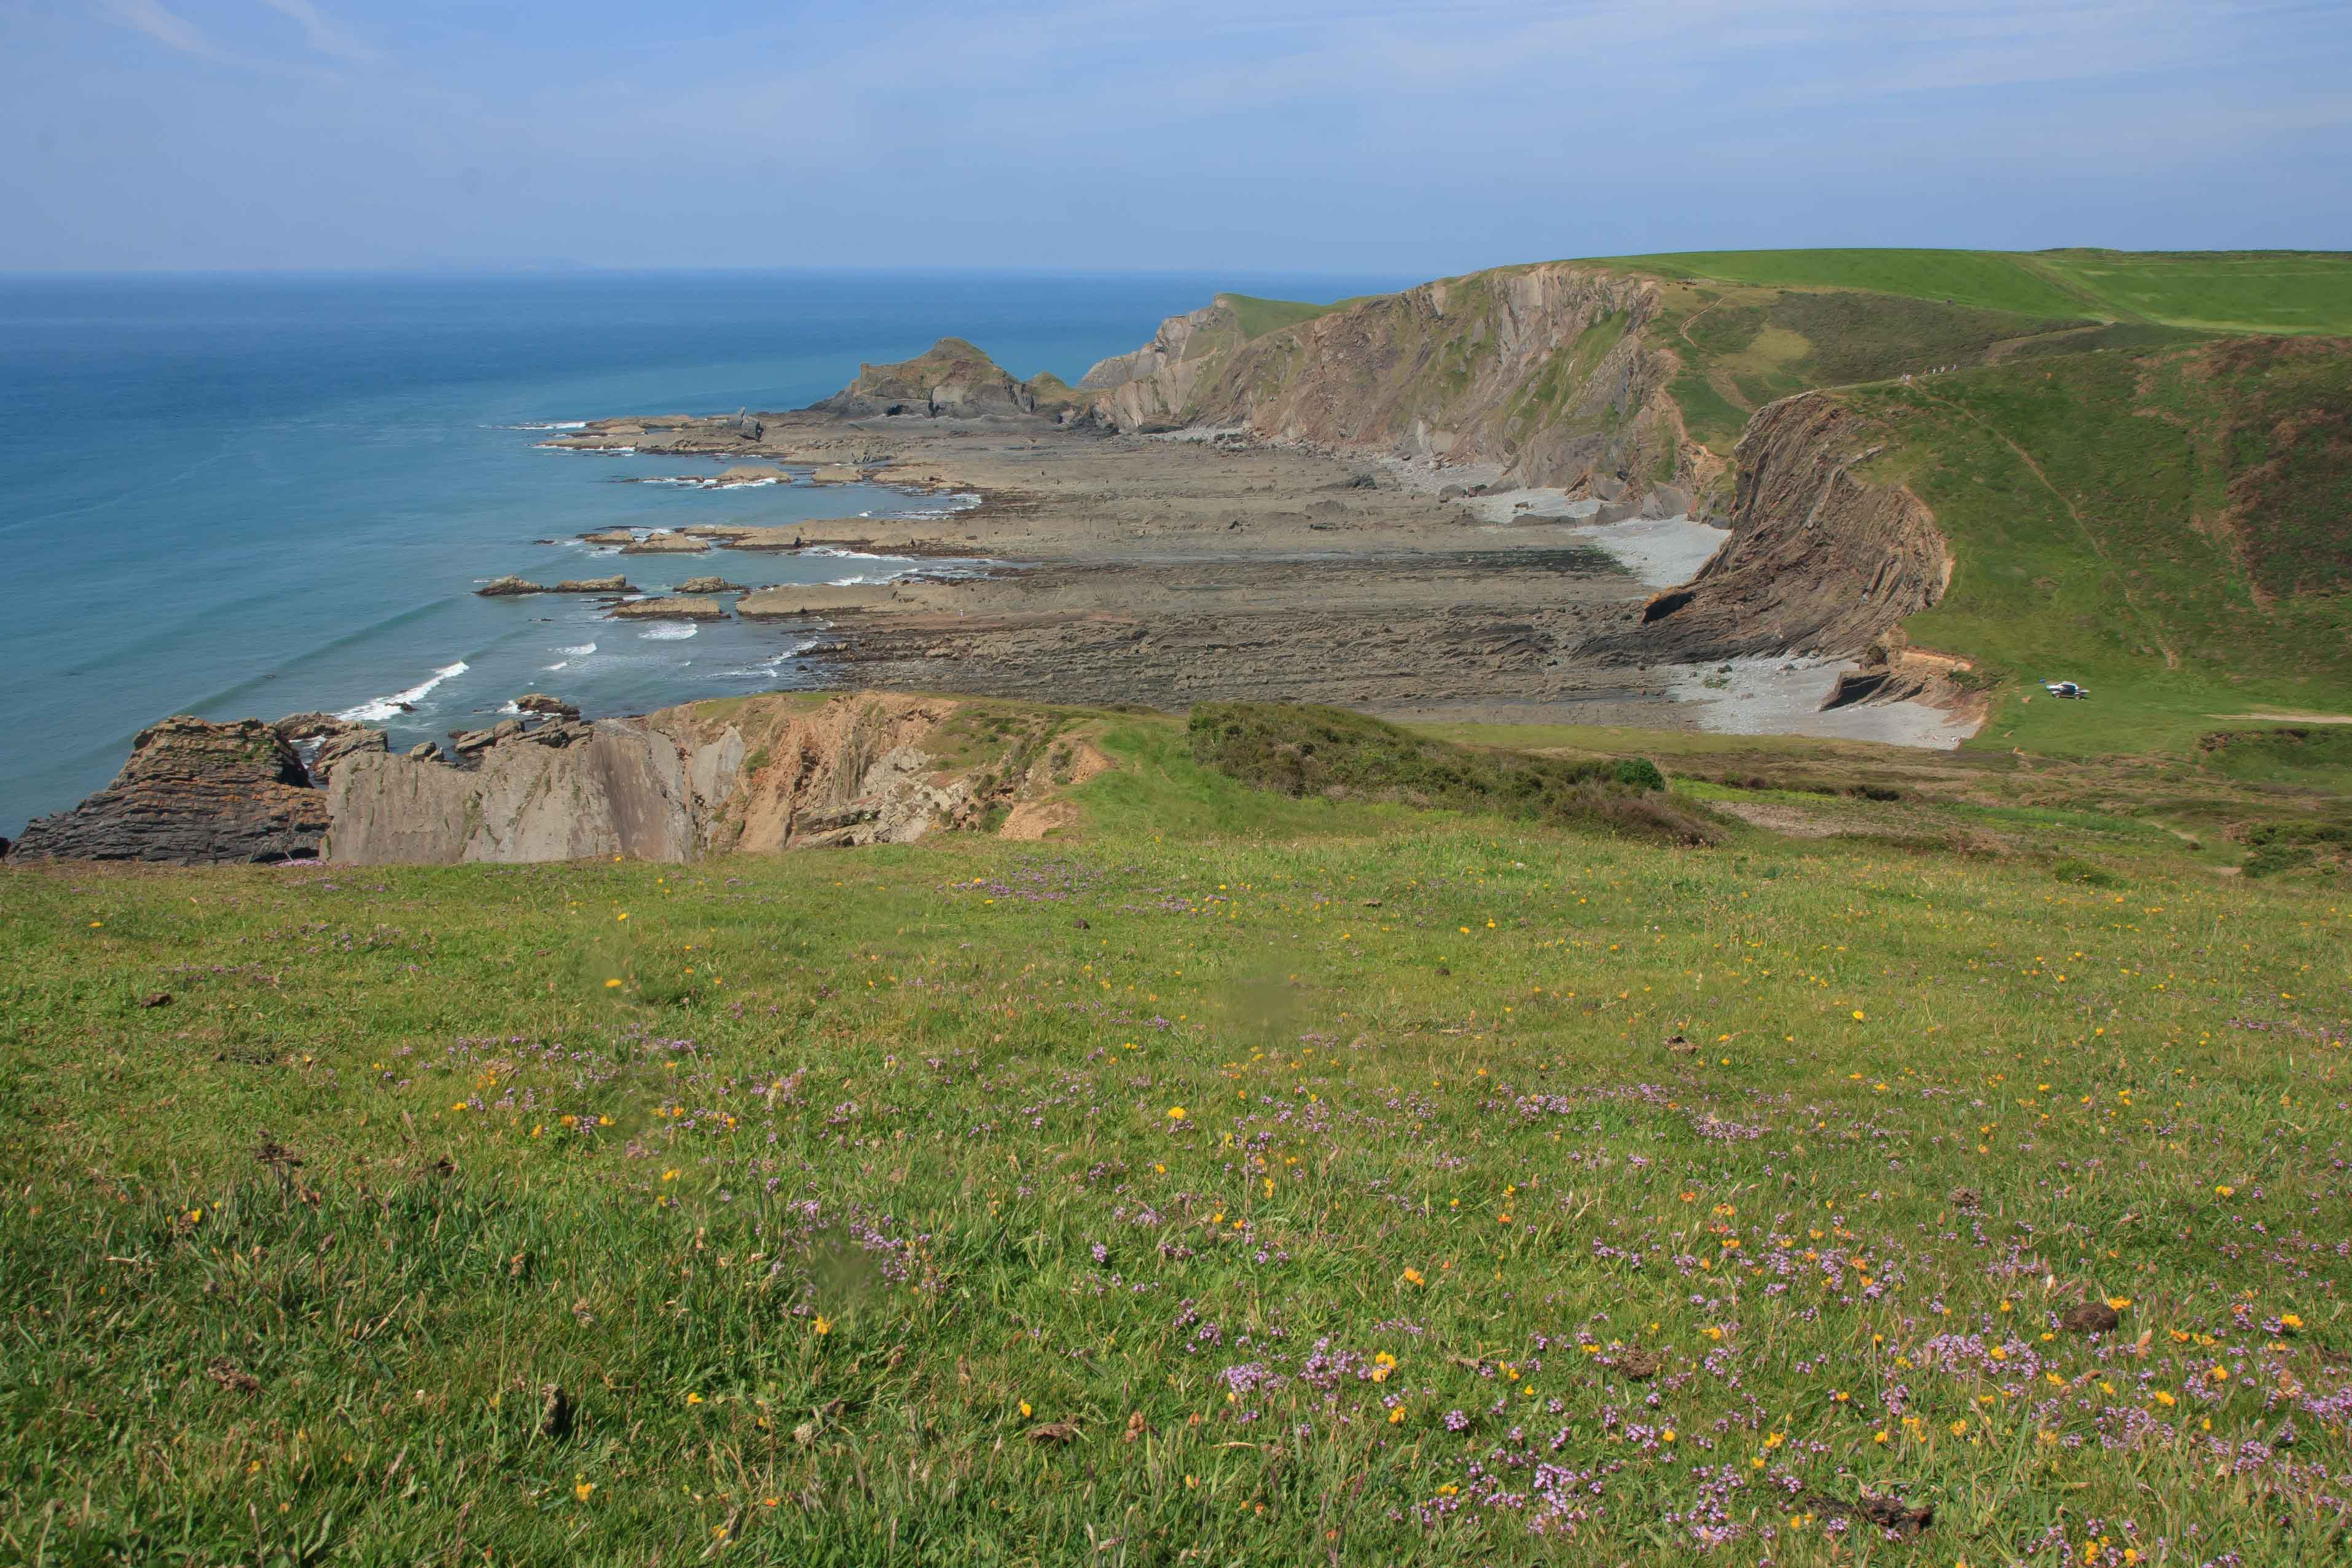 Coastline between Hartland Quay and Hartland Point